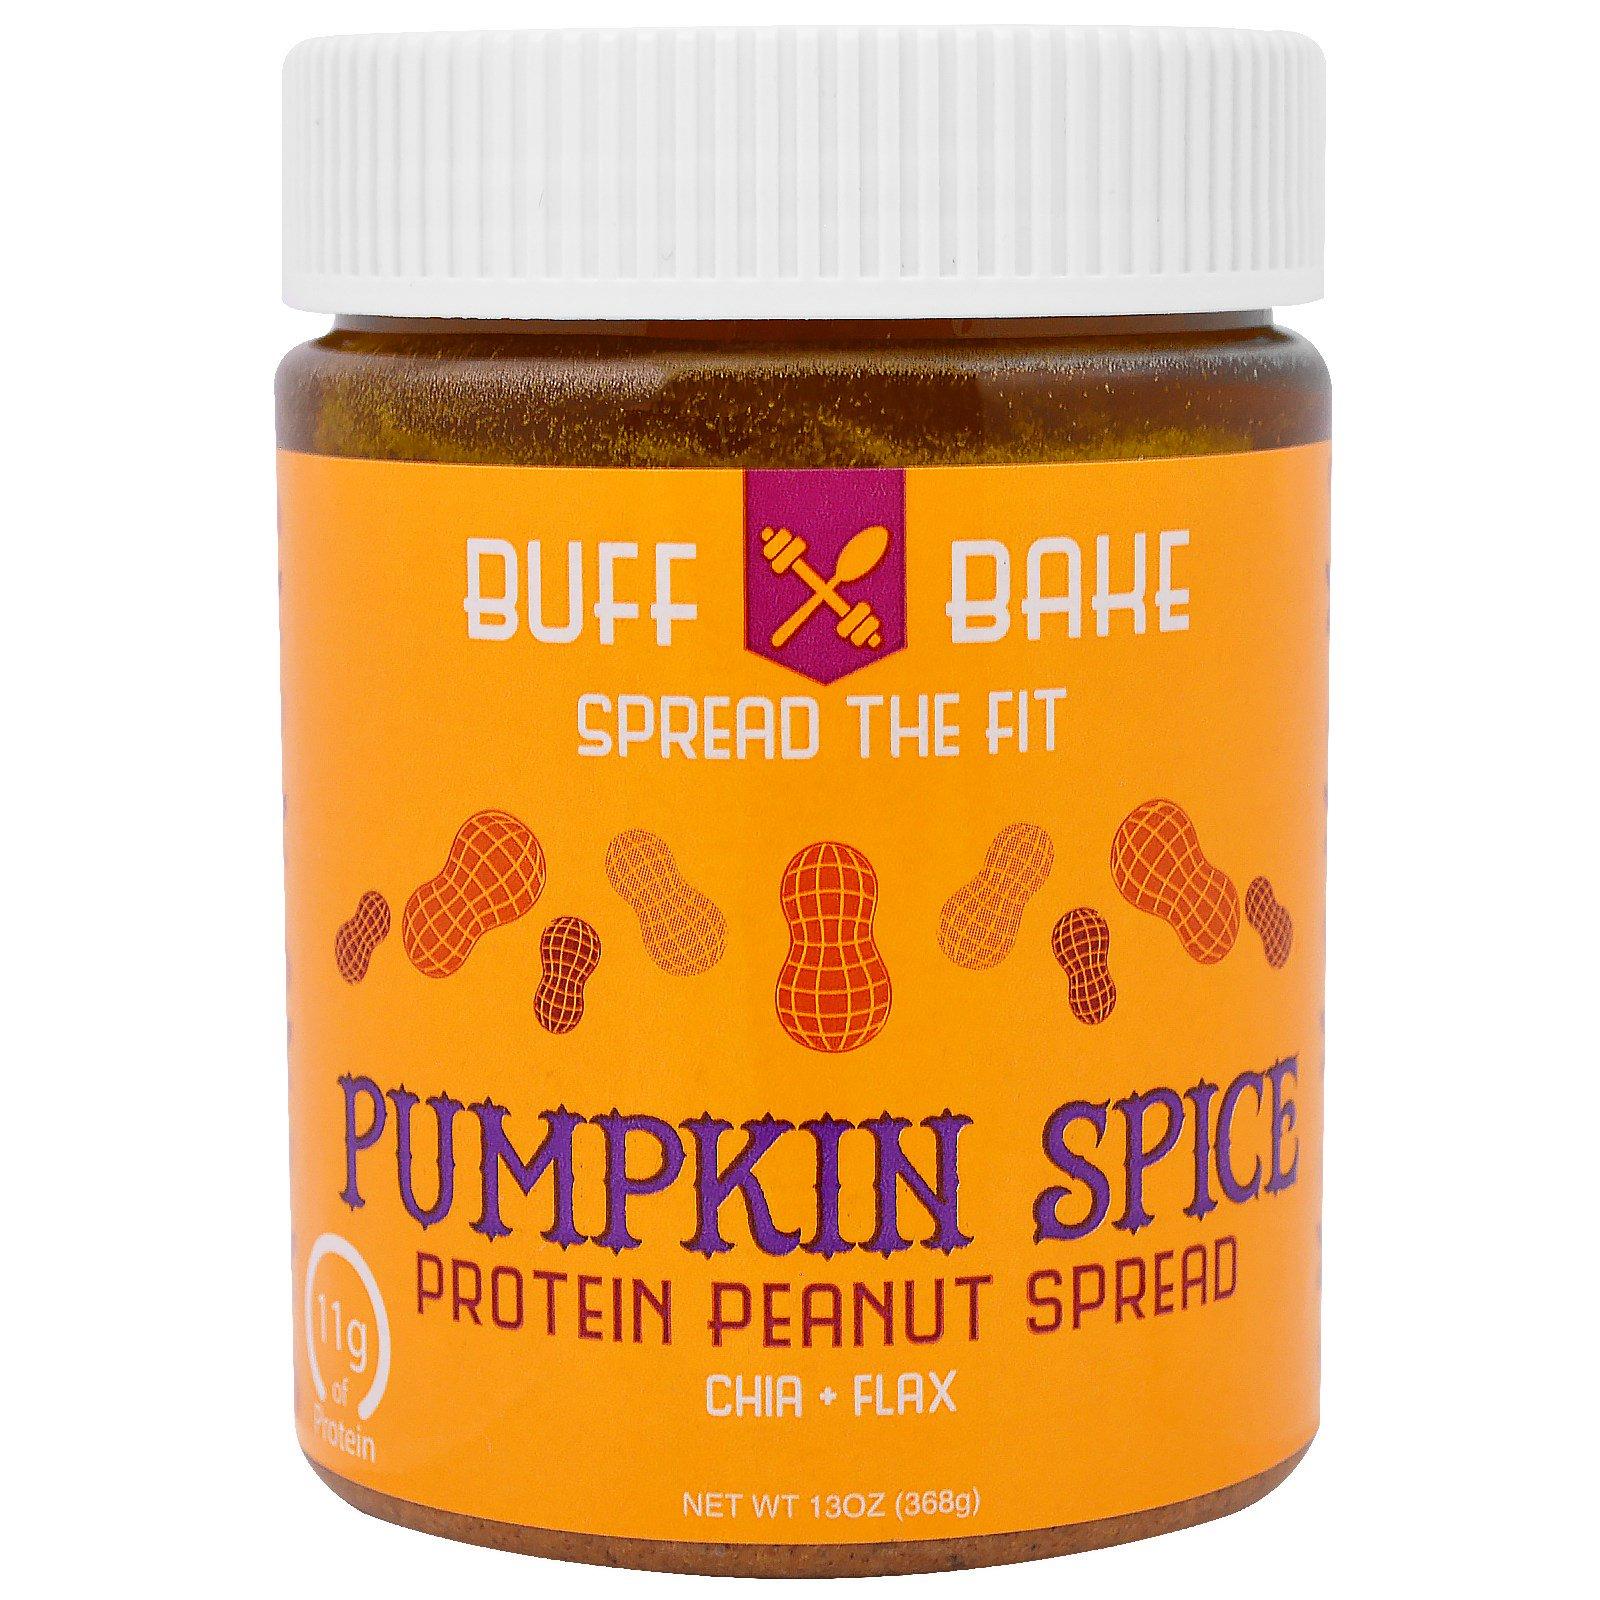 Buff Bake, Pumpkin Spice Протеиновая Миндальная Намазка, 13 унций (368 г)